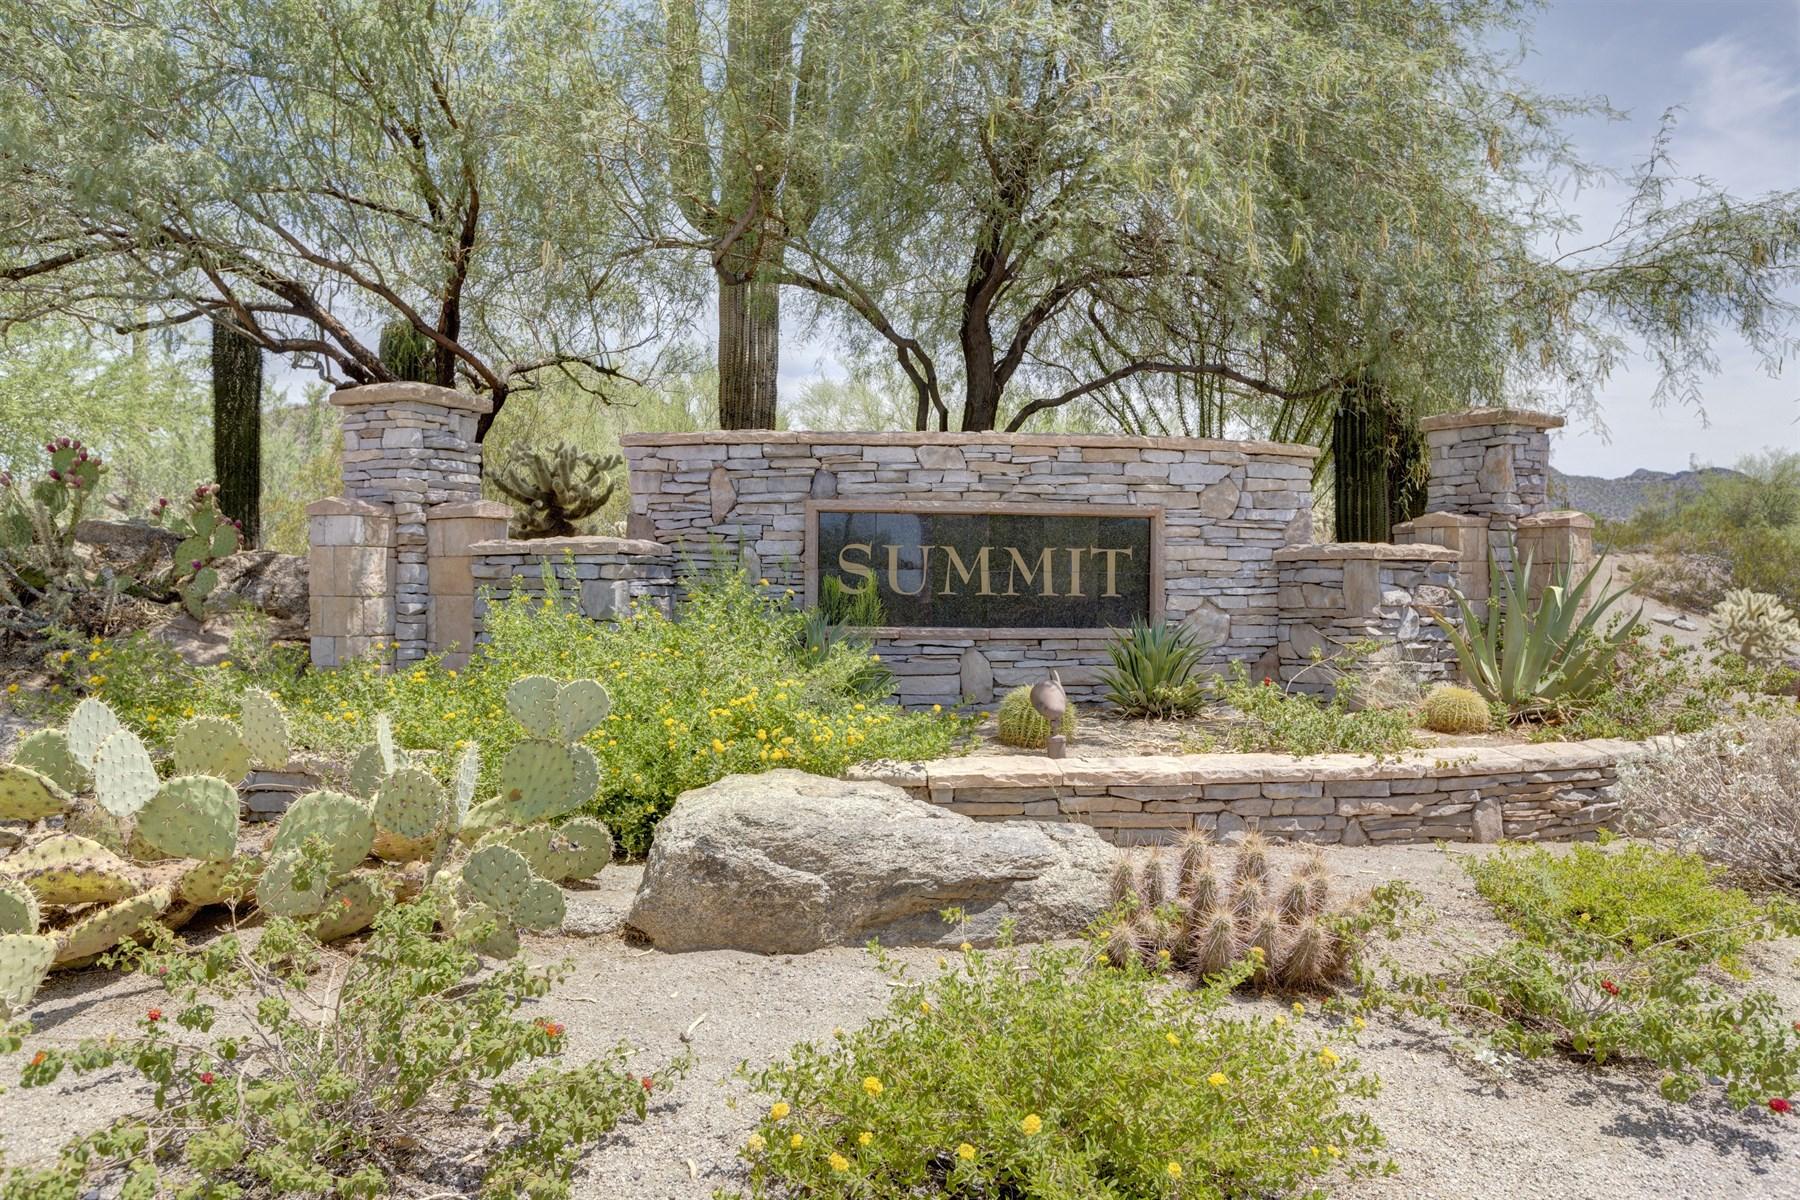 Đất đai vì Bán tại Spectacular lot located in the exclusive Summit neighborhood of Las Sendas. 4334 N YARROW CIR 34 Mesa, Arizona 85207 Hoa Kỳ